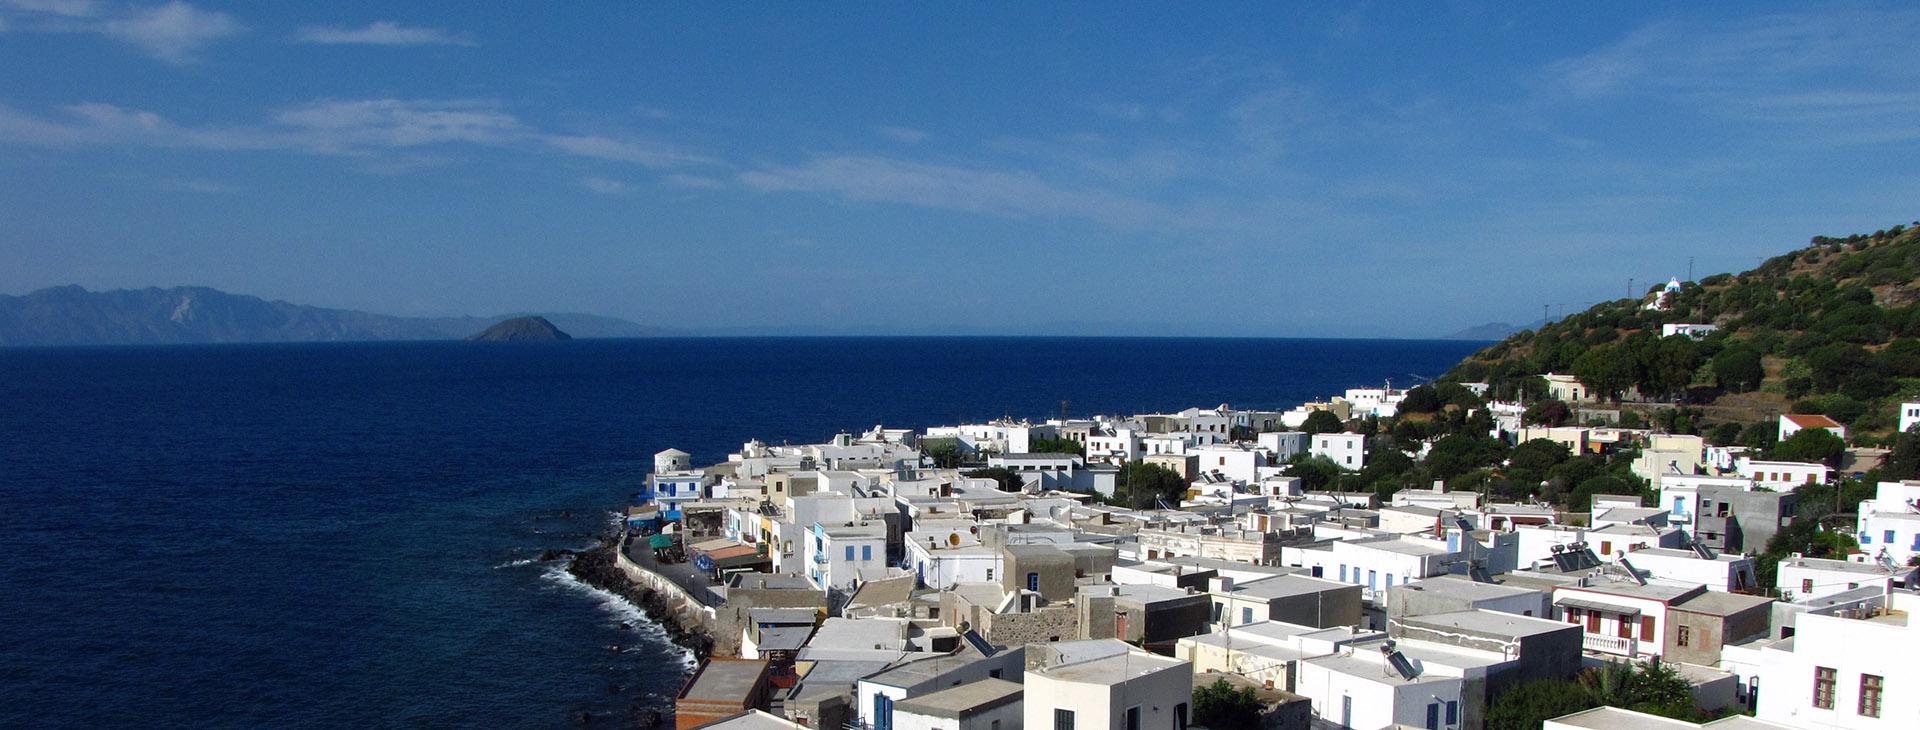 Nissiros island